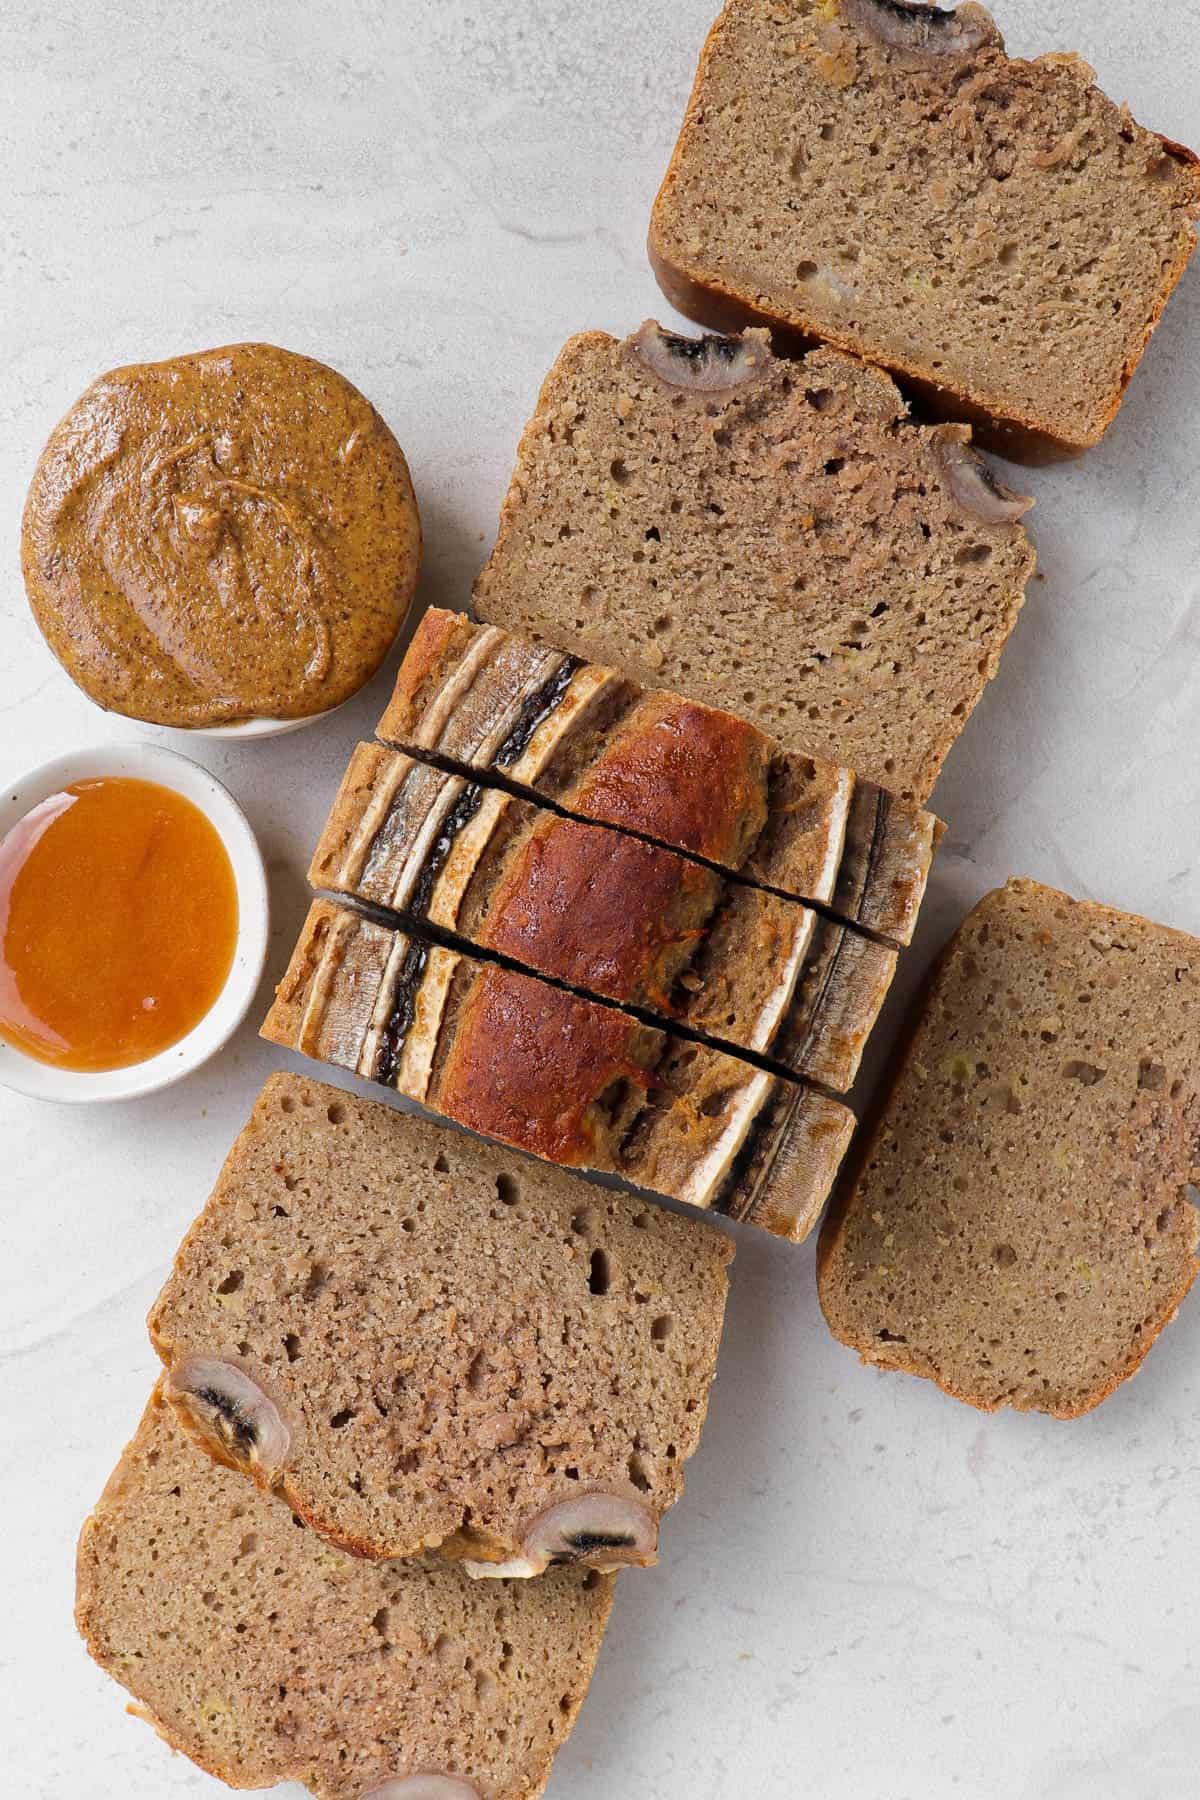 Sliced up bread for inside shot.